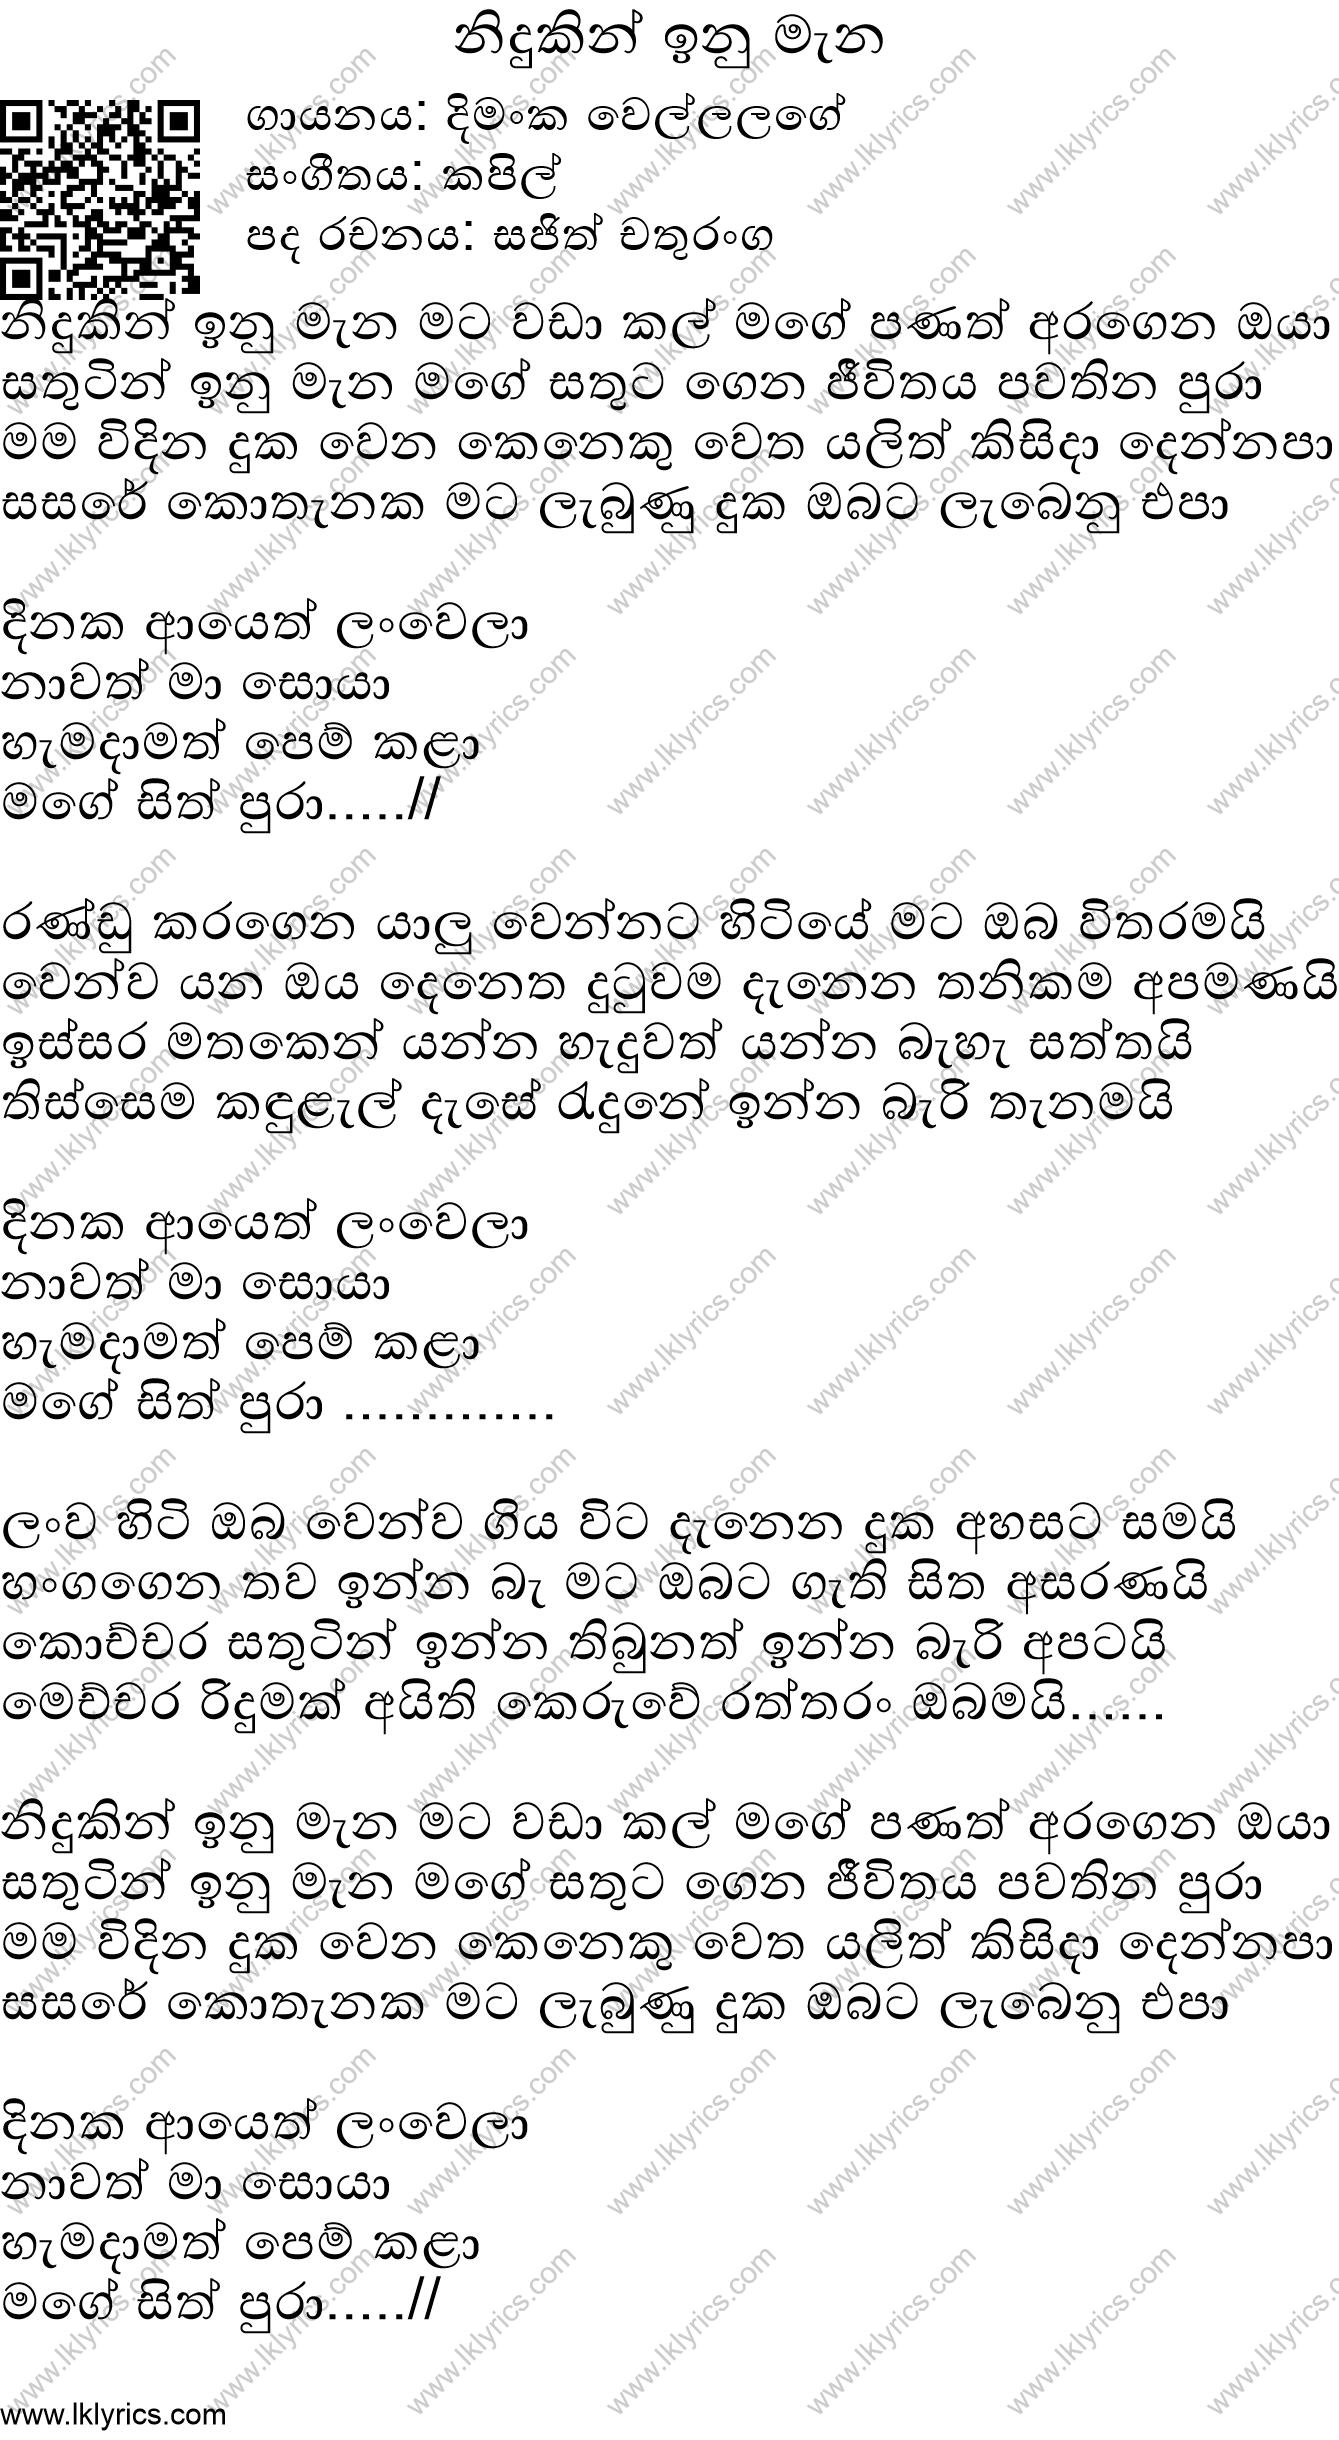 Nidukin Inumana Lyrics - LK Lyrics